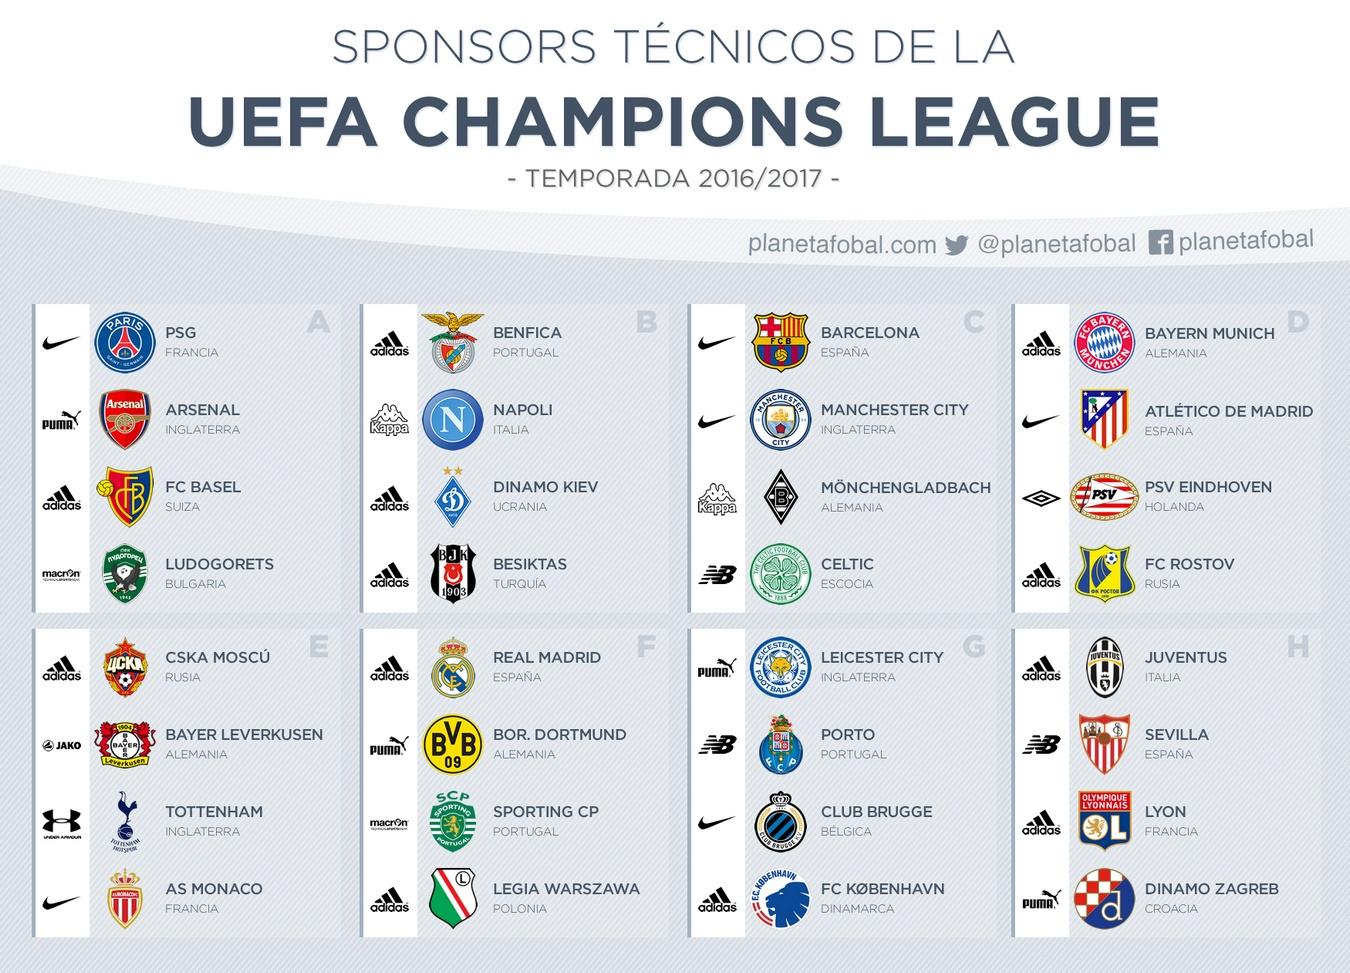 sponsors tecnicos de la uefa champions league 2016 2017 infografias uefa champions league 2016